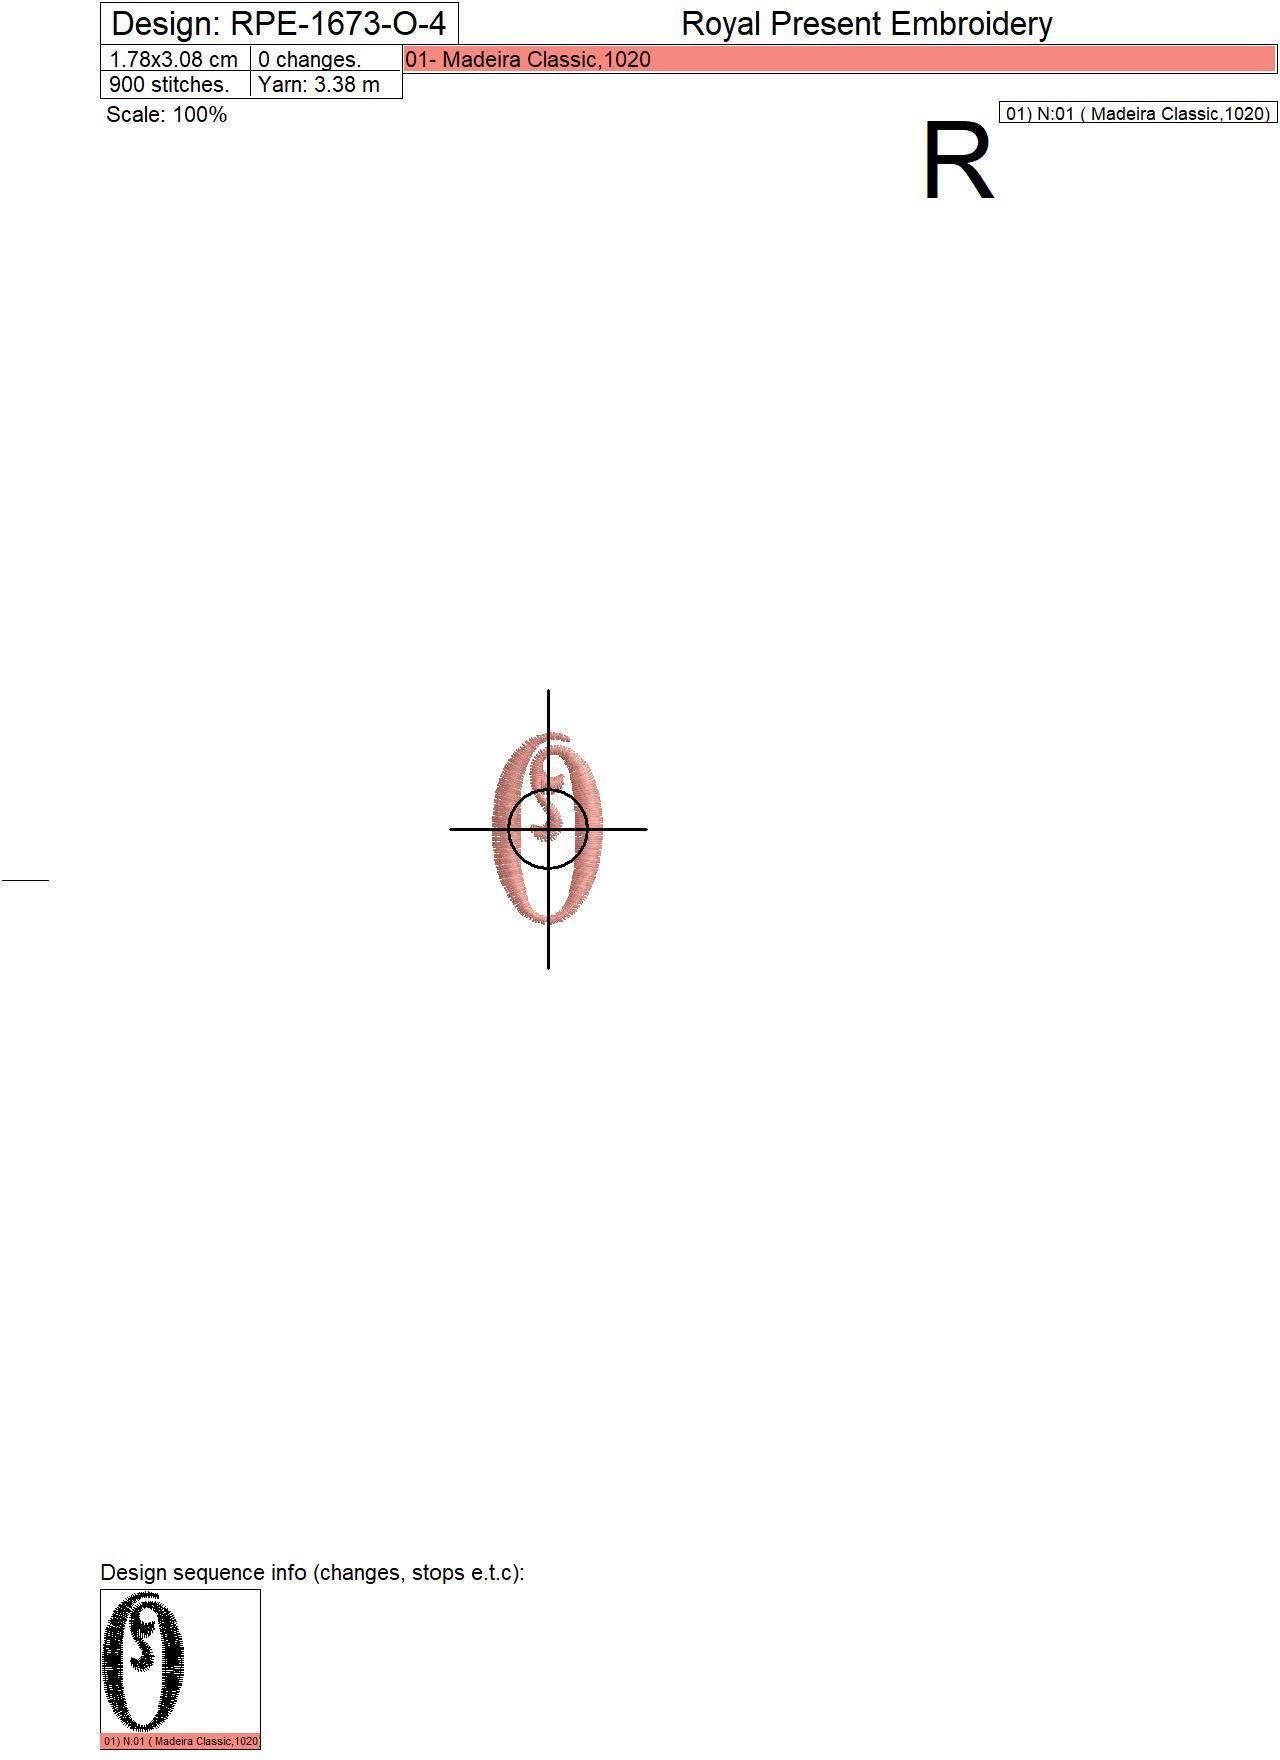 Capital Letter O Embroidery design V4